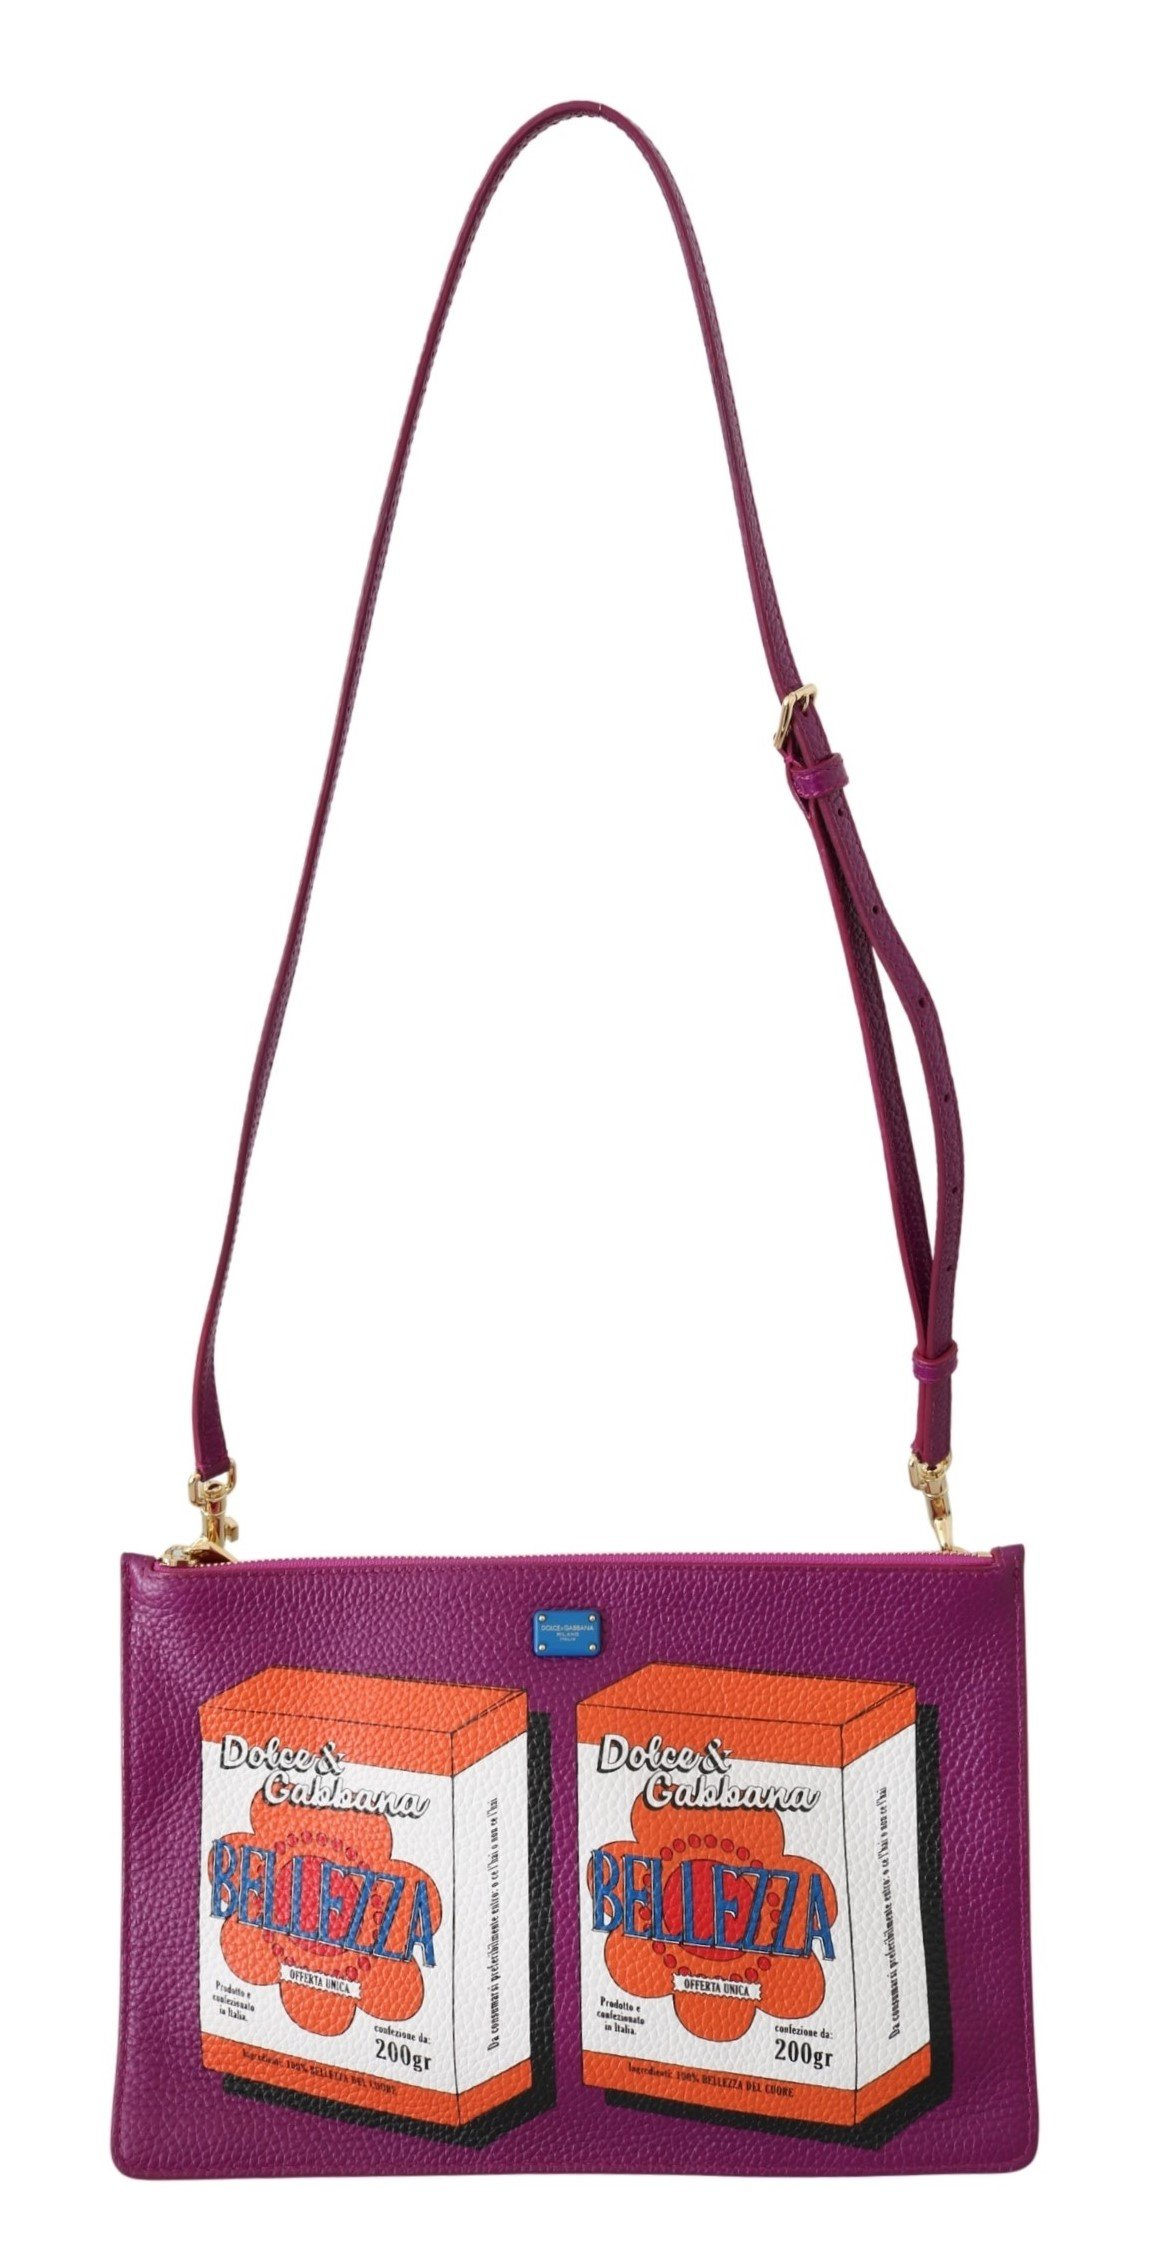 Dolce & Gabbana Women's Bellezza Sling Shoulder Bag Purple VAS8860